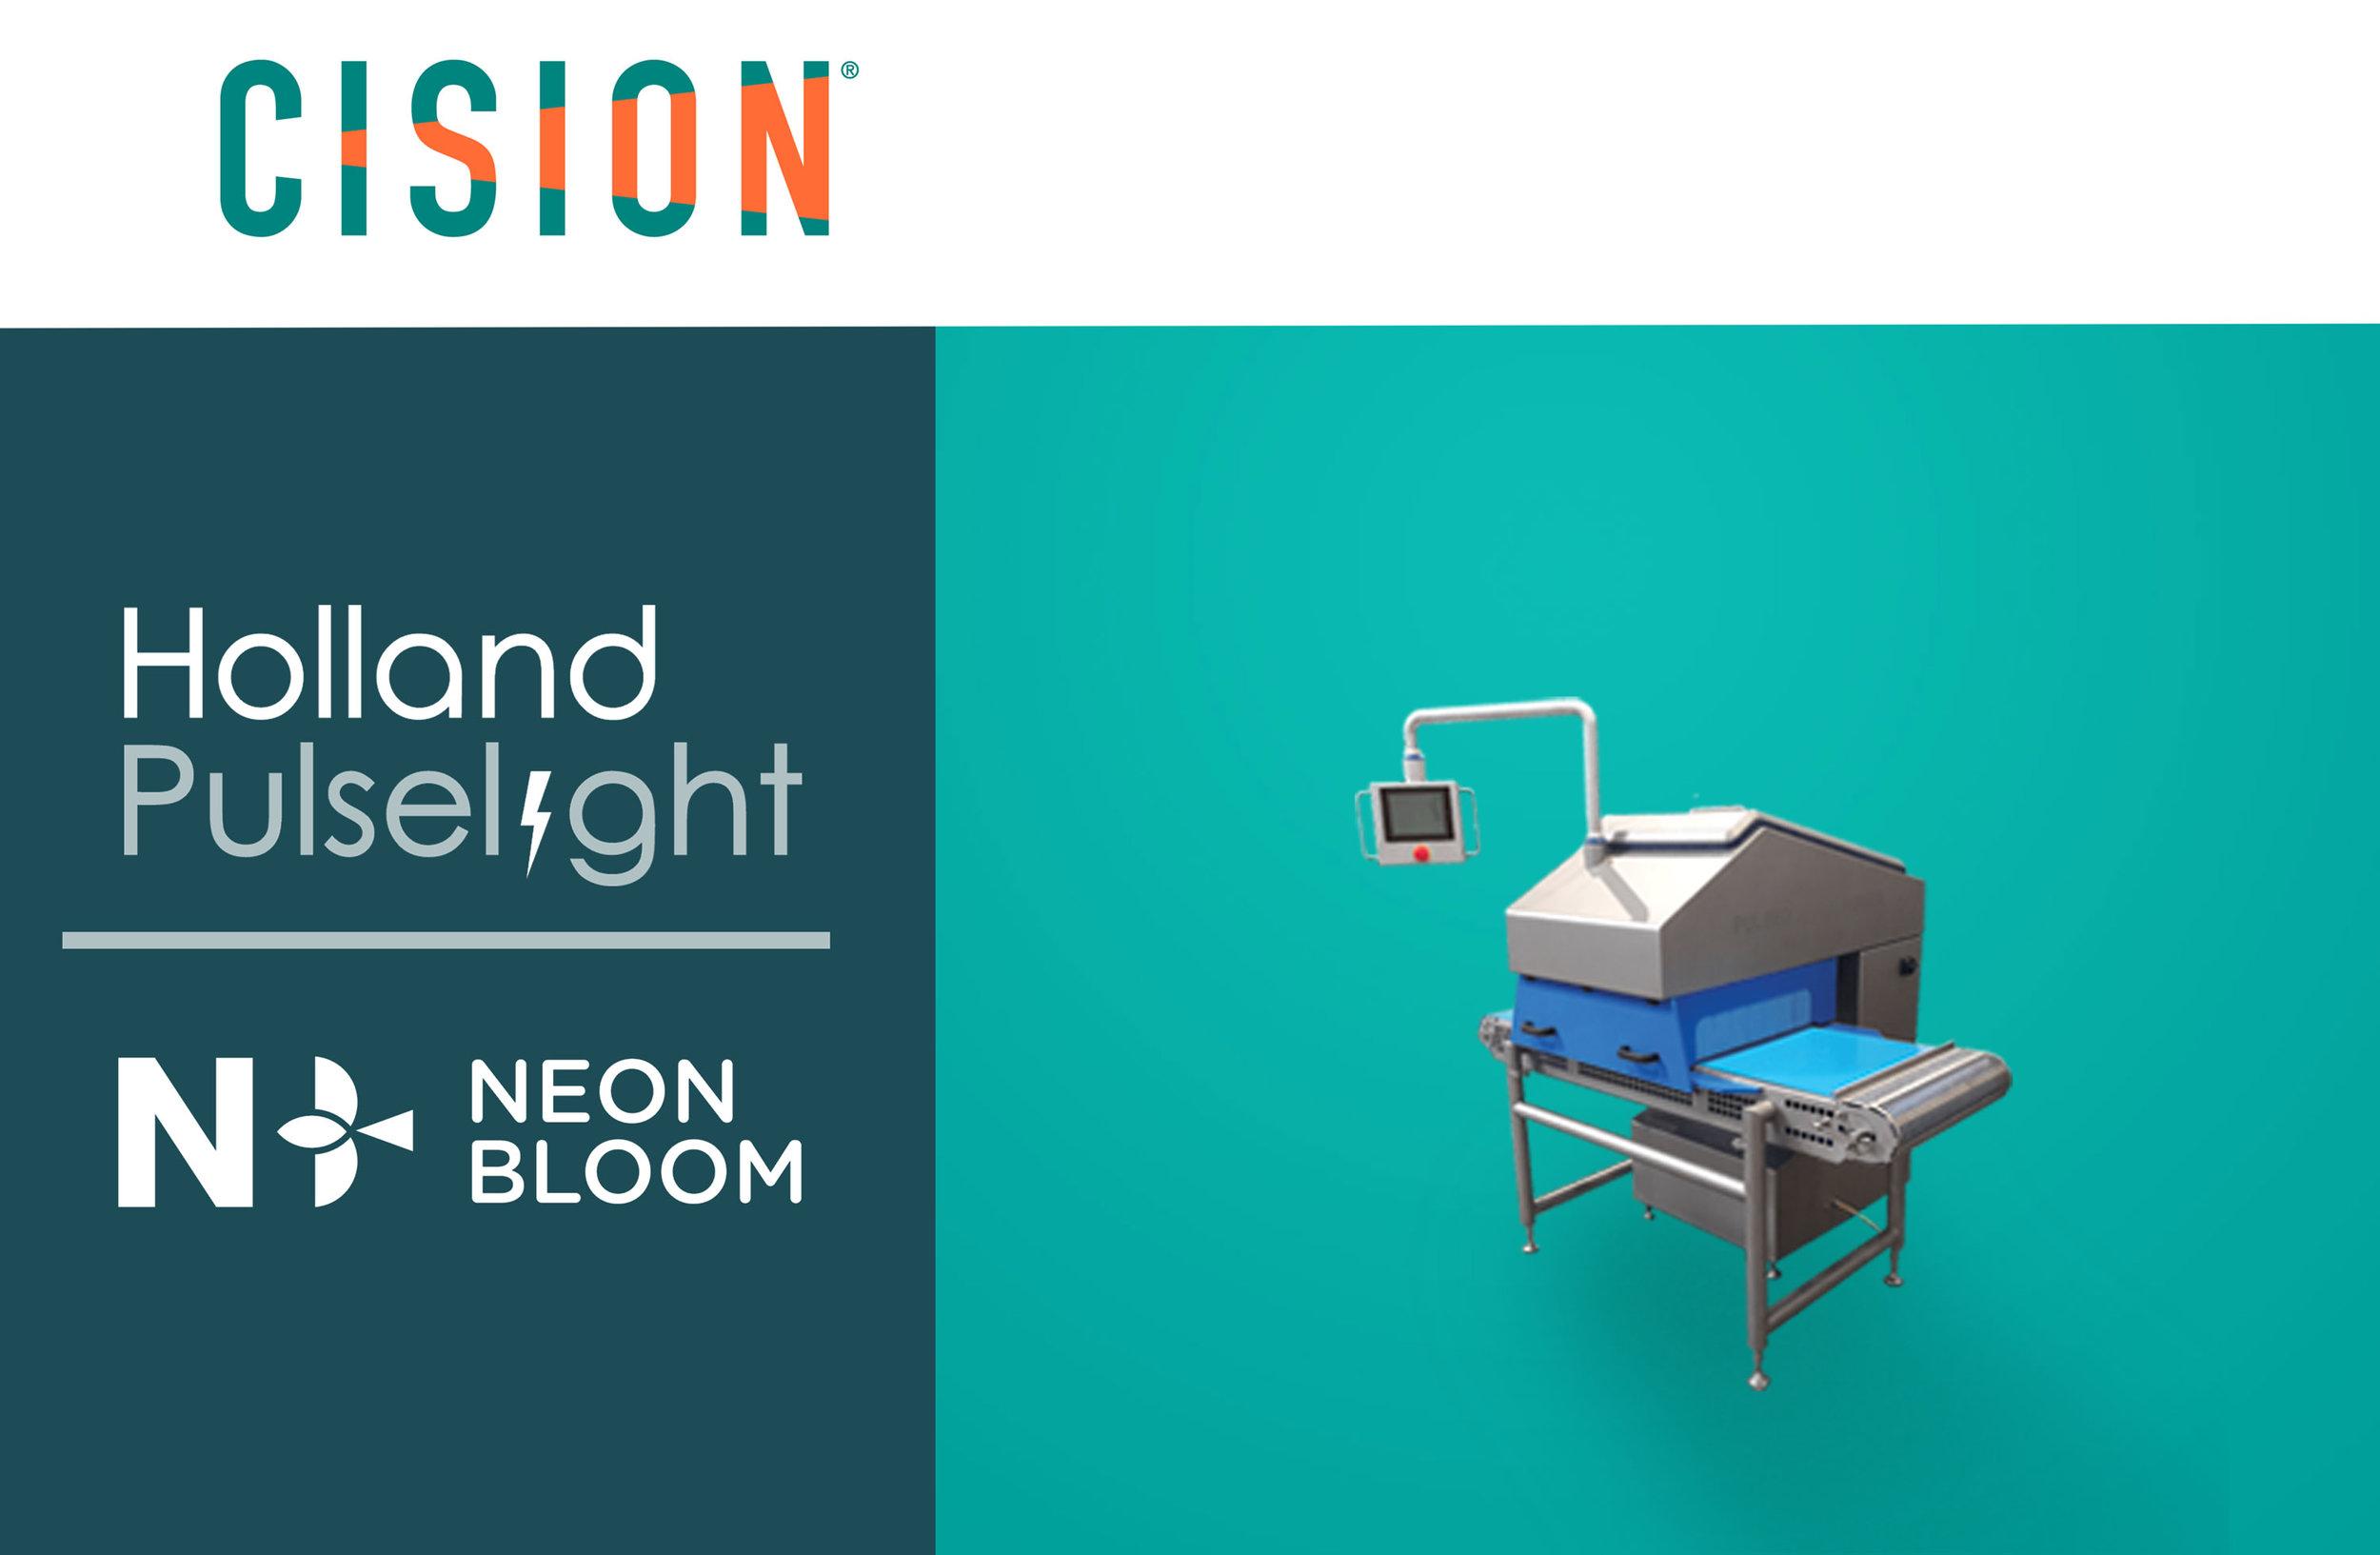 Neon_blog_template_2.jpg